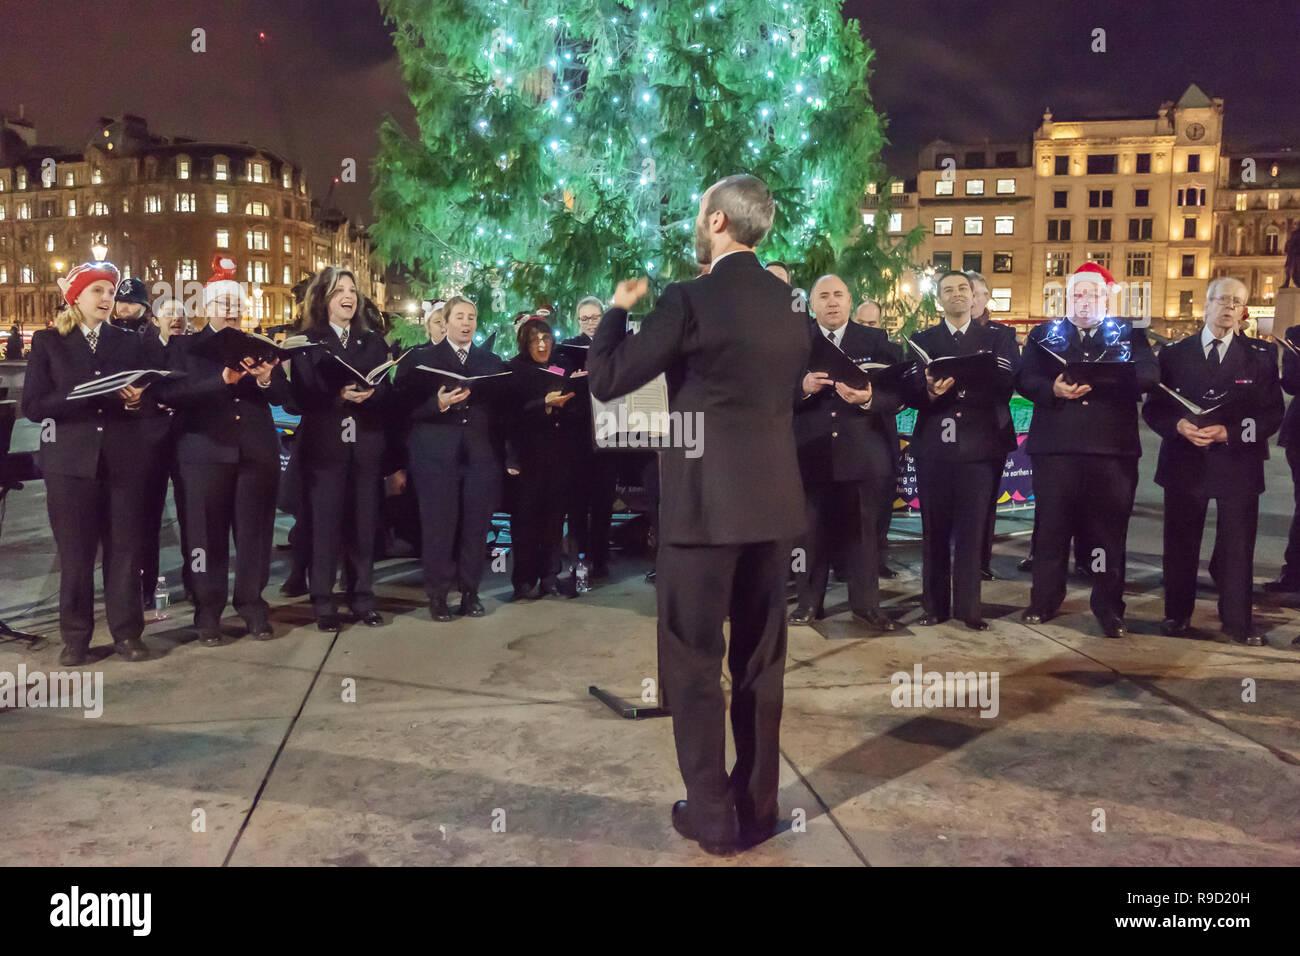 Metropolitan Police Choir sing Christmas carols at Trafalgar Square, Central London, England. Dec. 19, 2018 - Stock Image